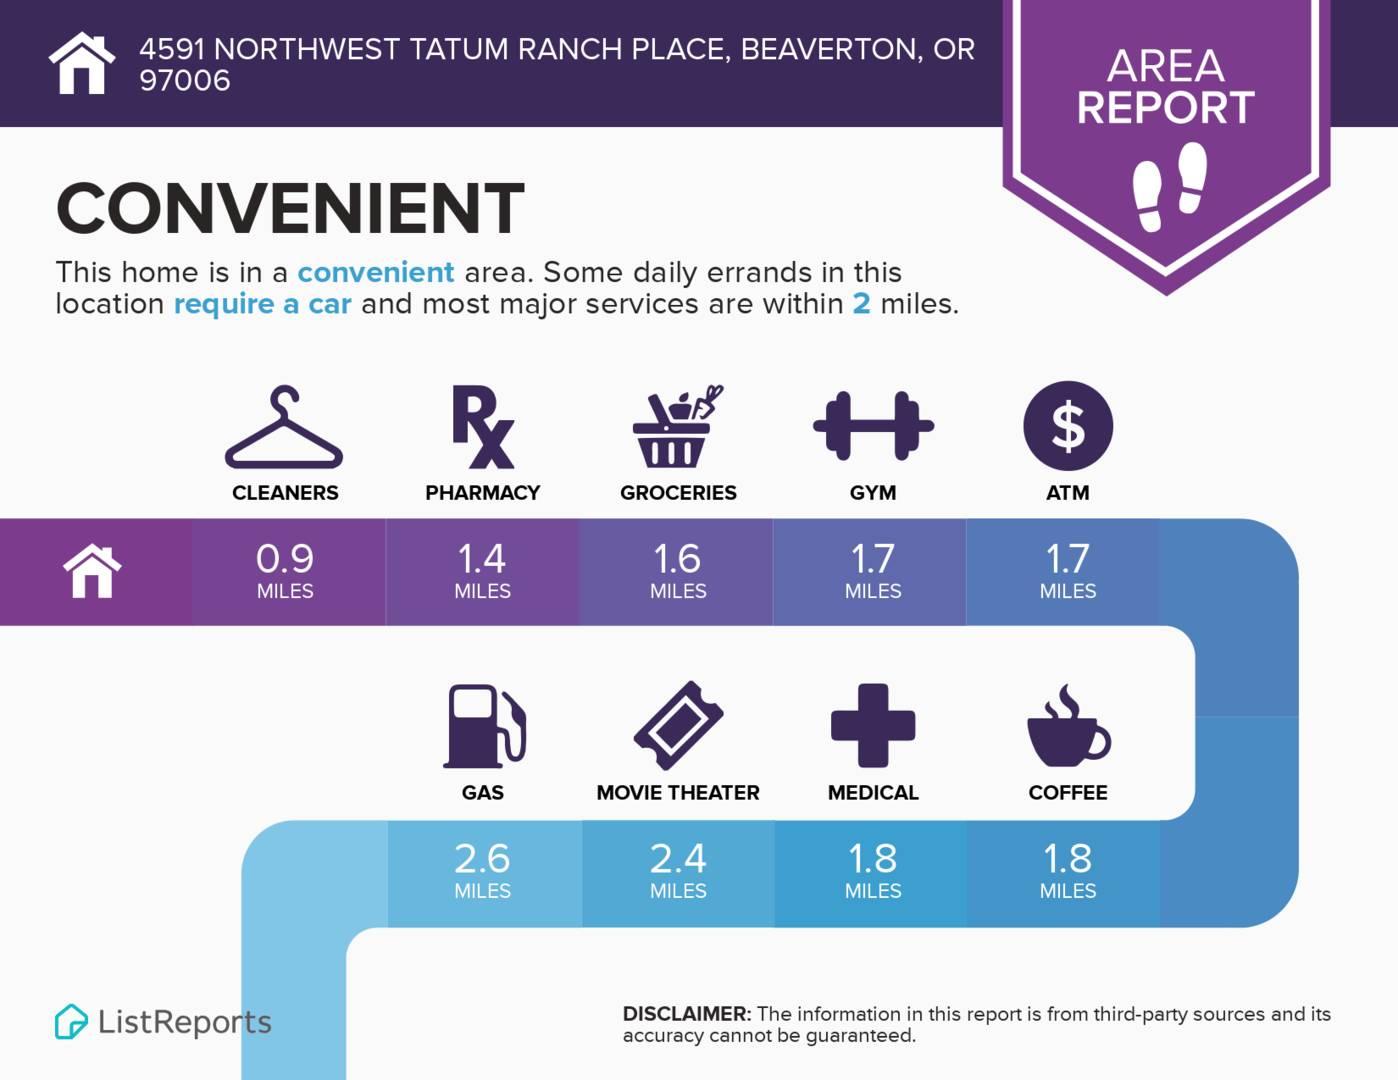 4591 NW Tatum Ranch Pl Beaverton, OR 97006